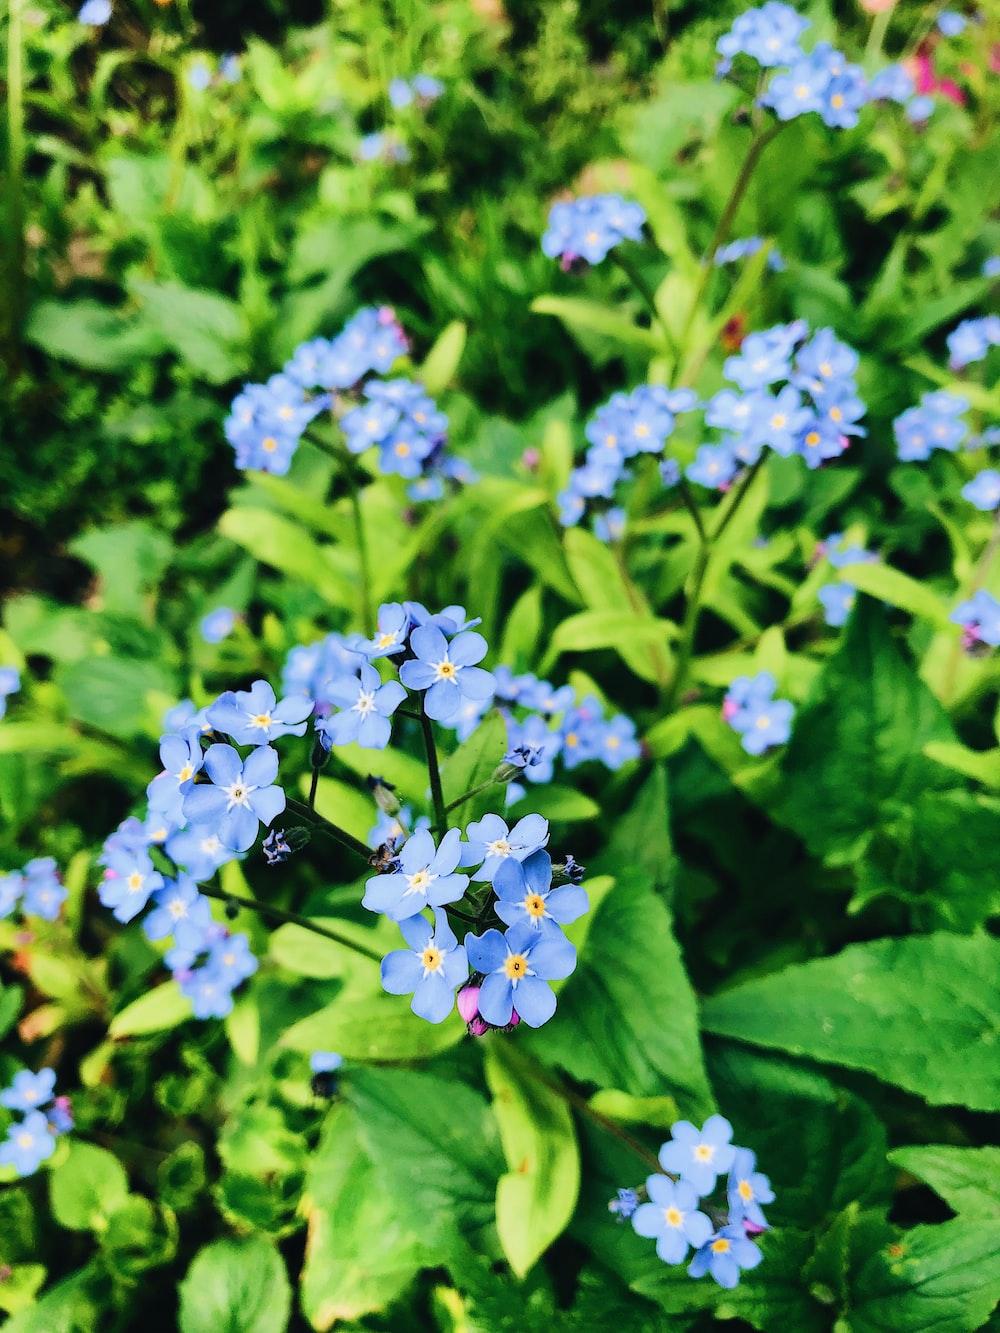 blue petaled cluster flower blooming at daytime